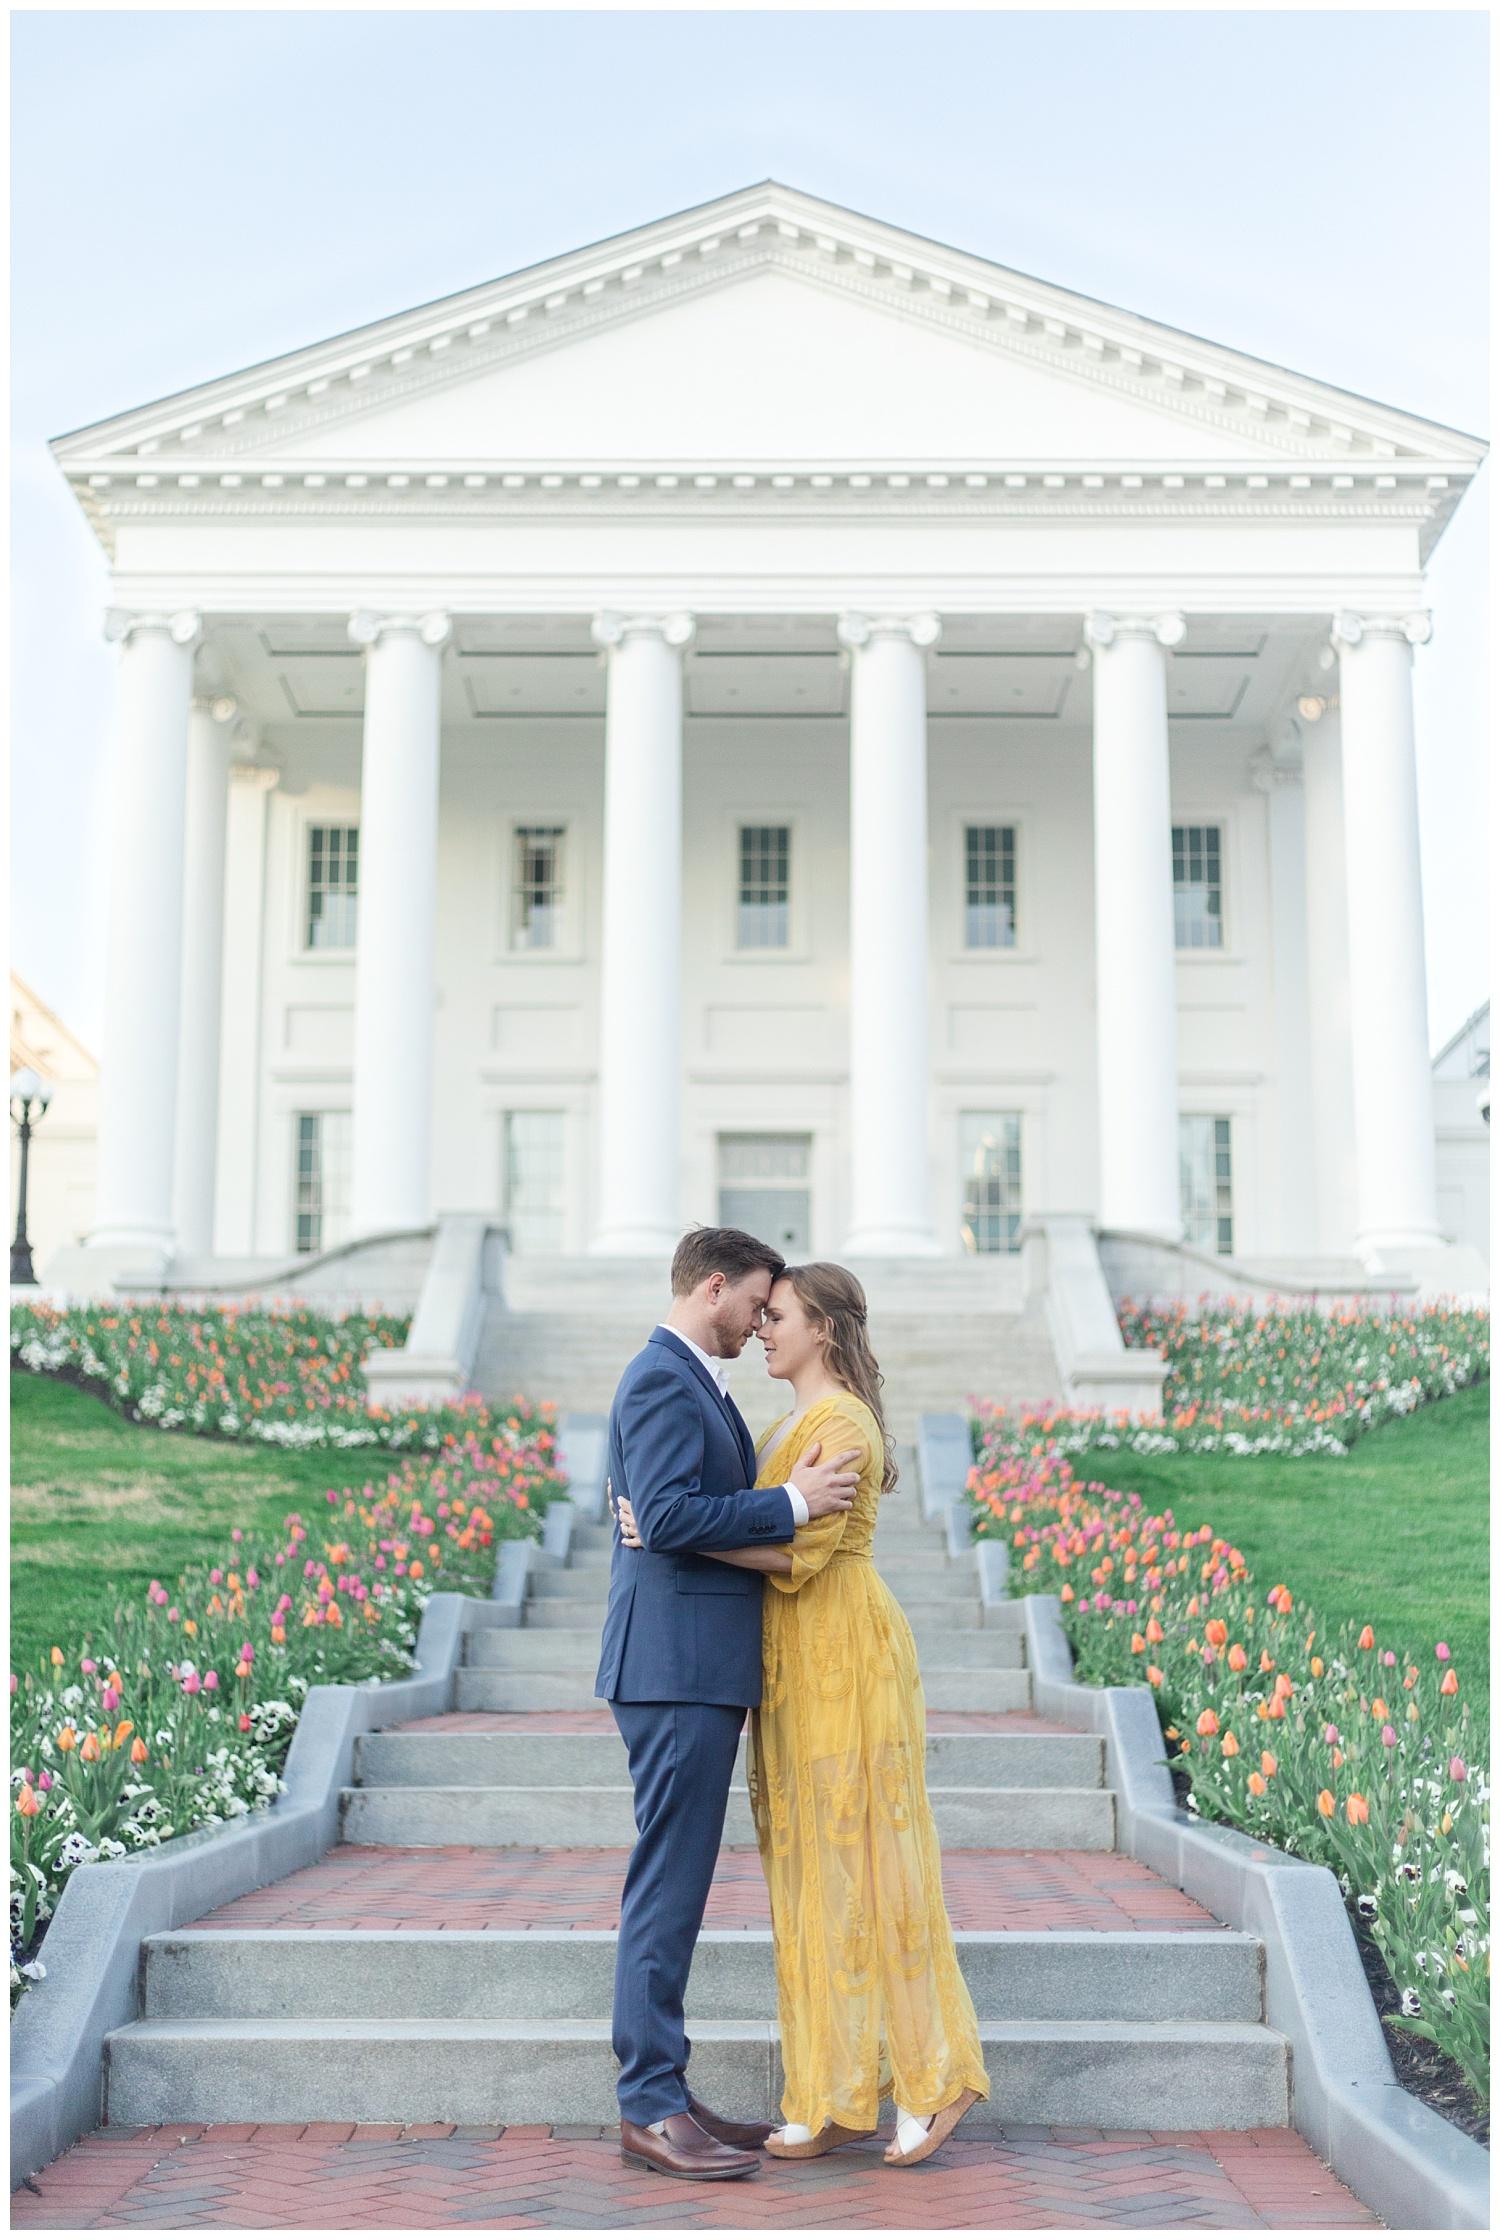 Richmond Cherry Blossom engagement session - Richmond VA Wedding Photographer